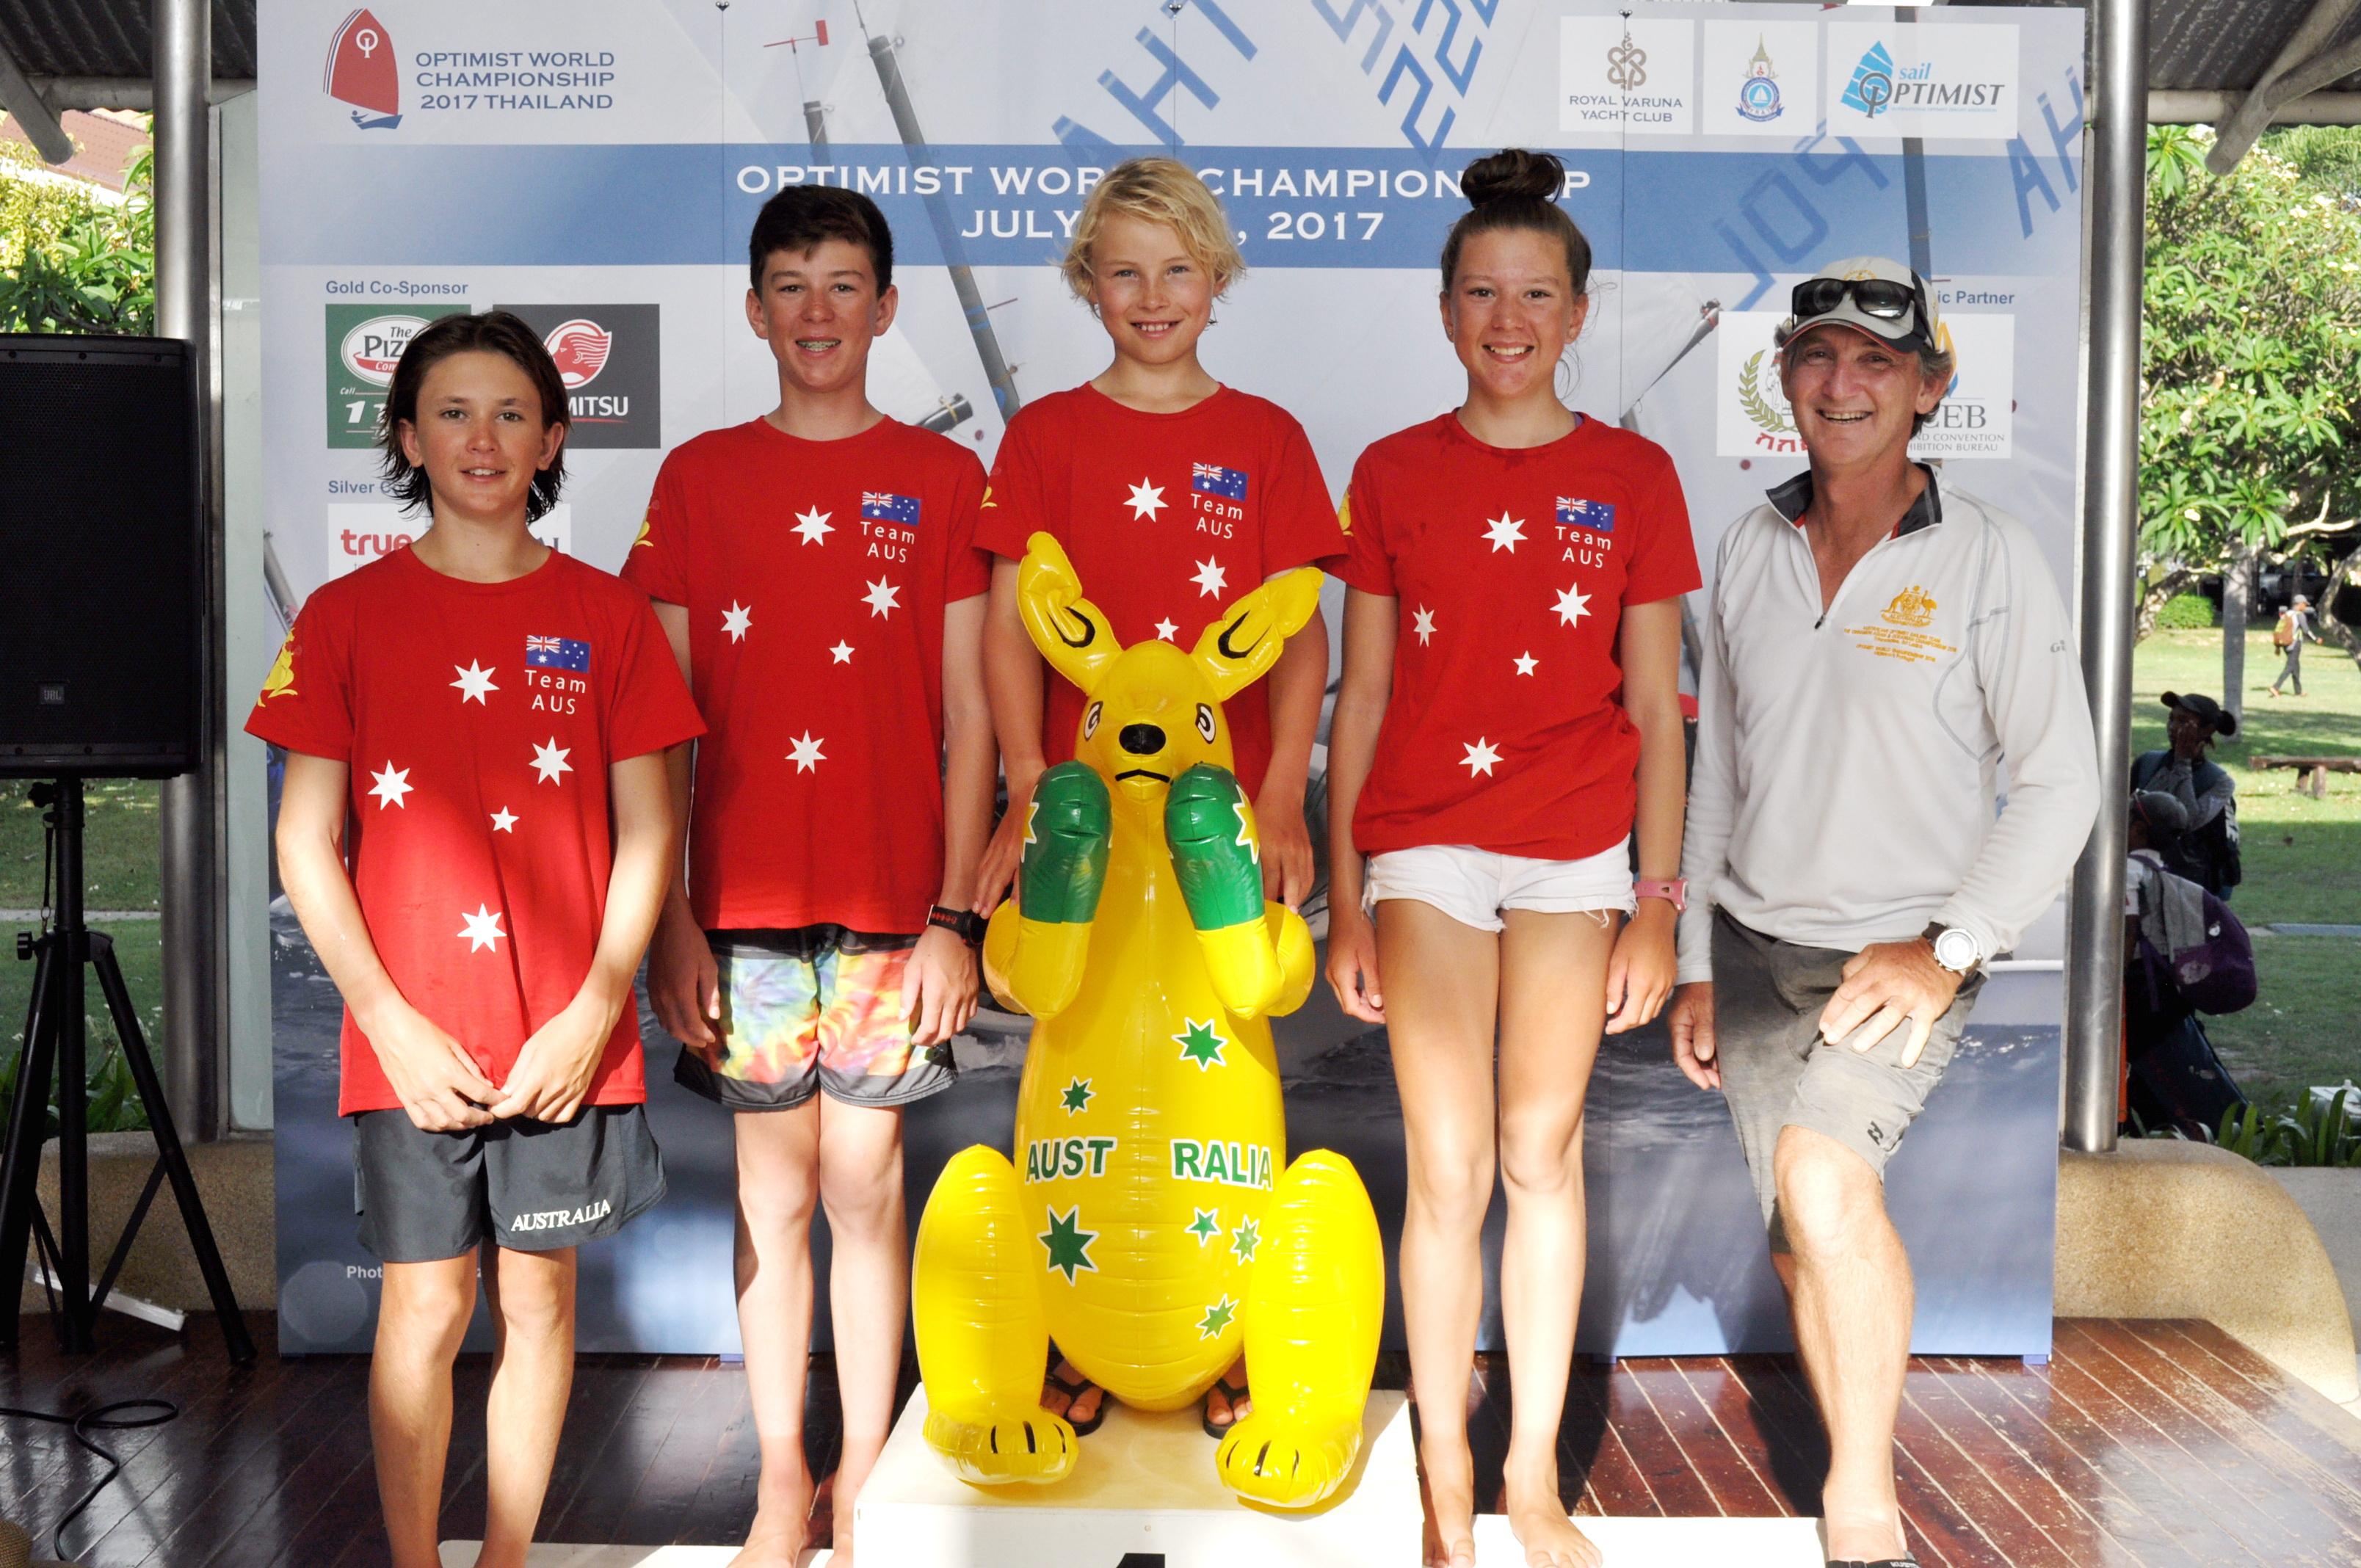 The Australian team.